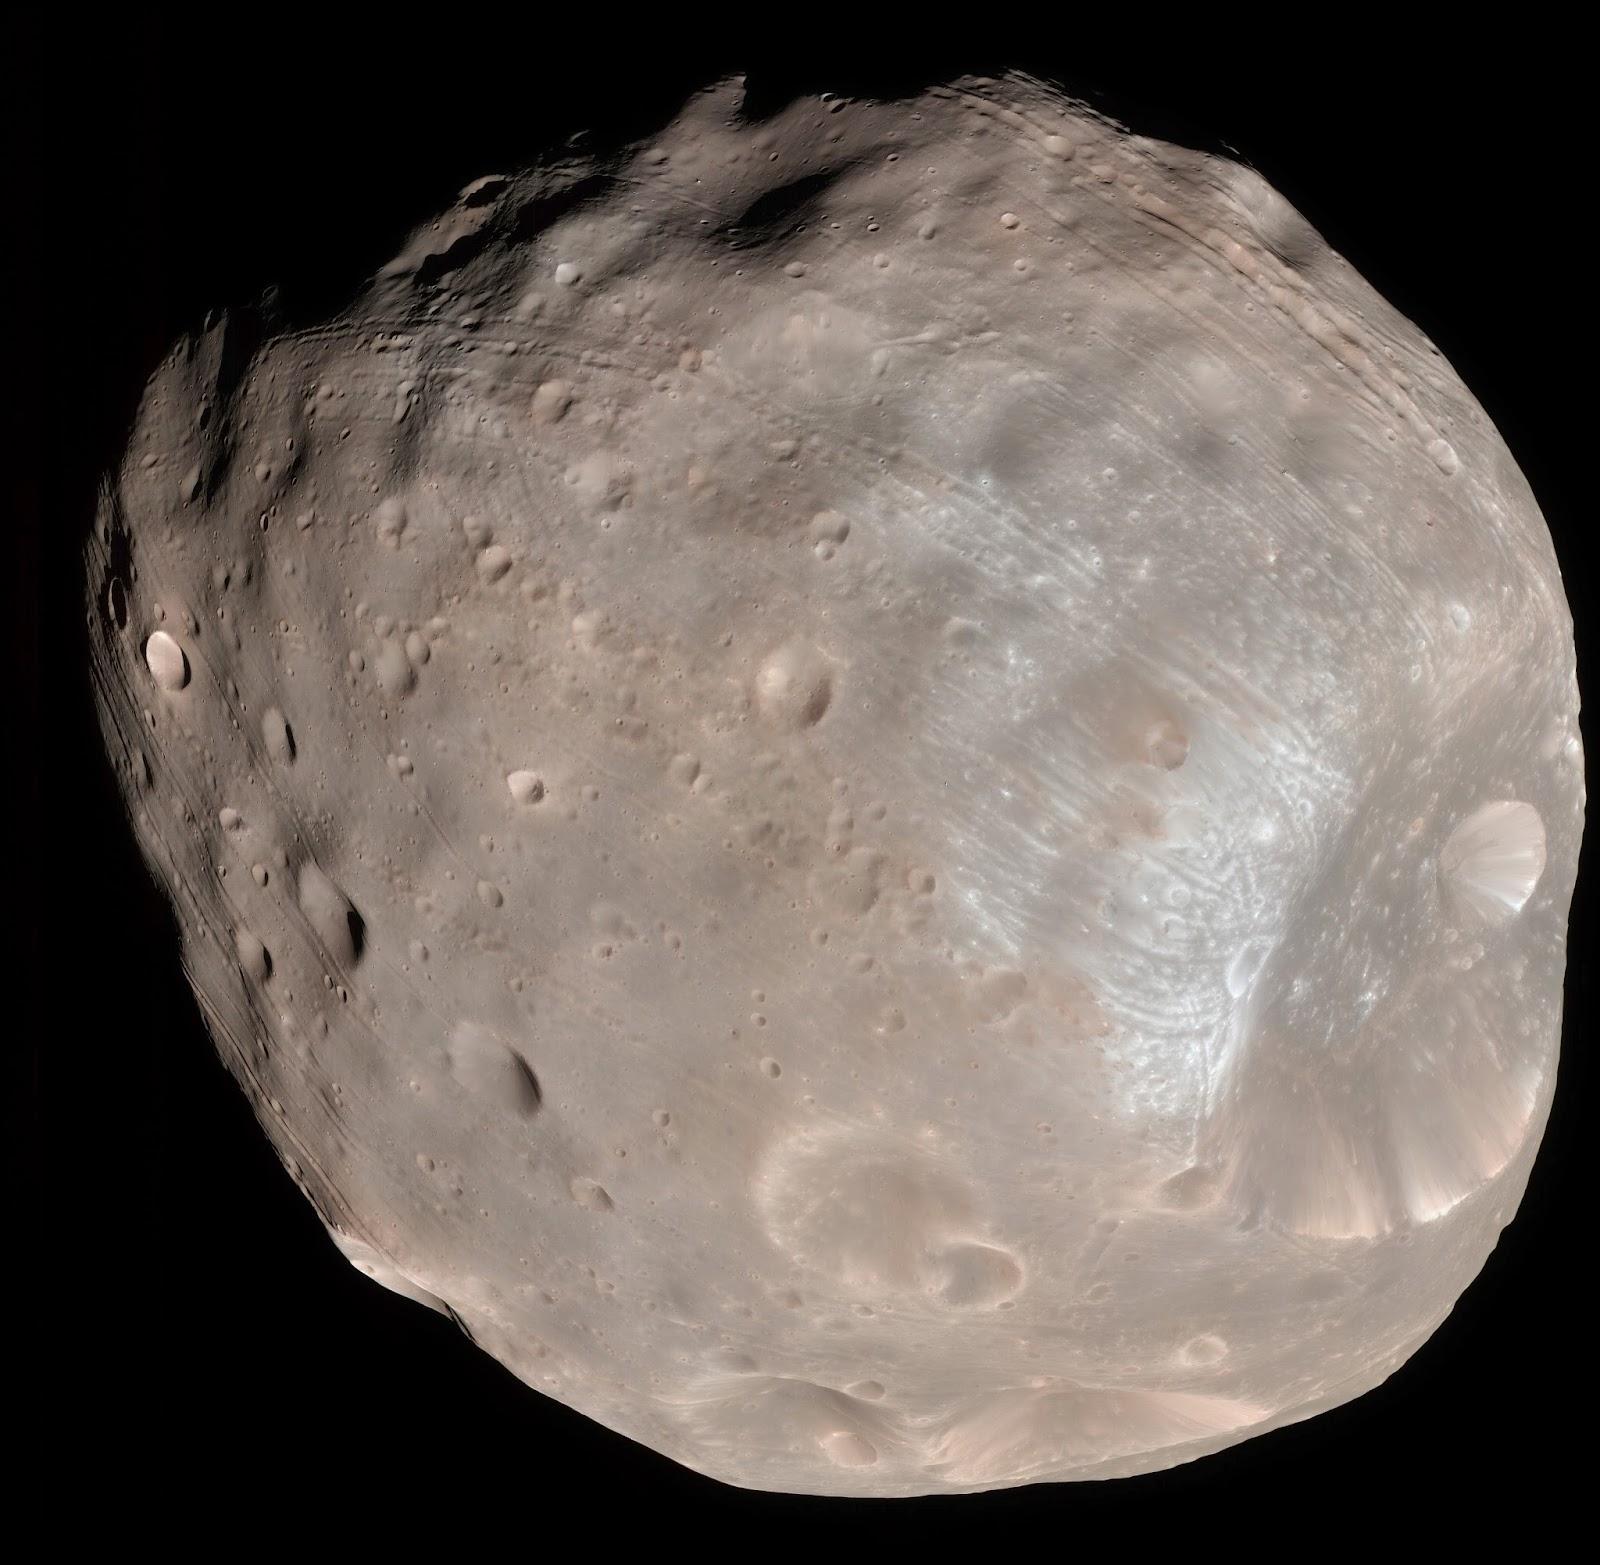 Phobos, mars moon